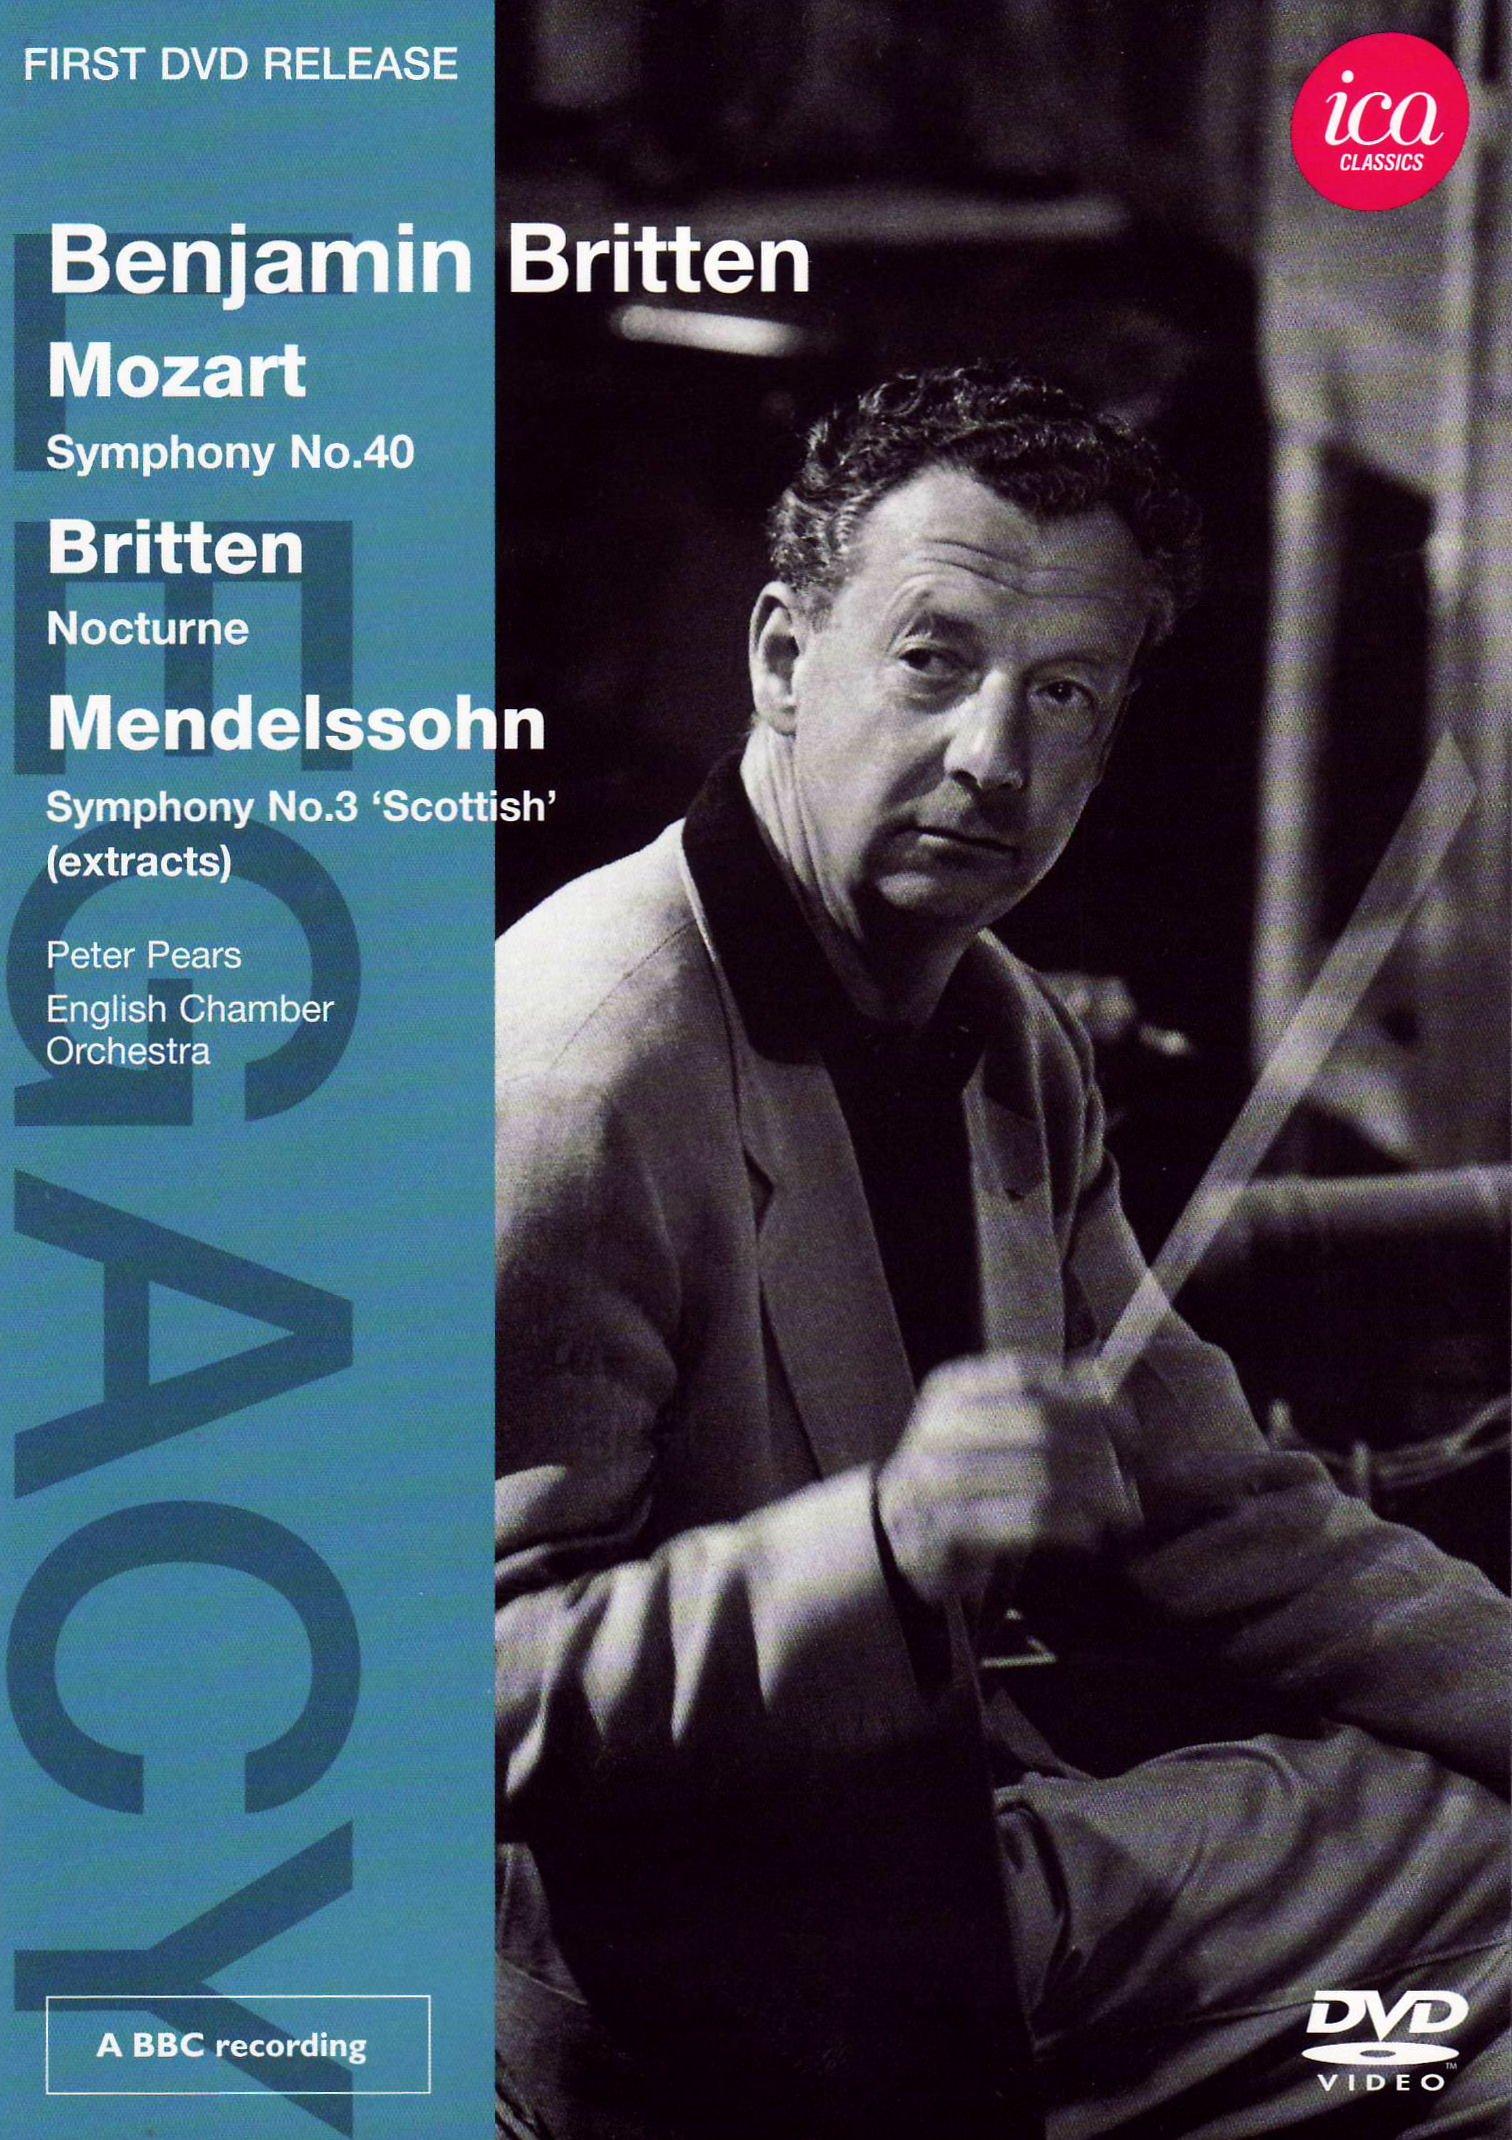 DVD : Peter Pears - Legacy: Benjamin Britten (DVD)